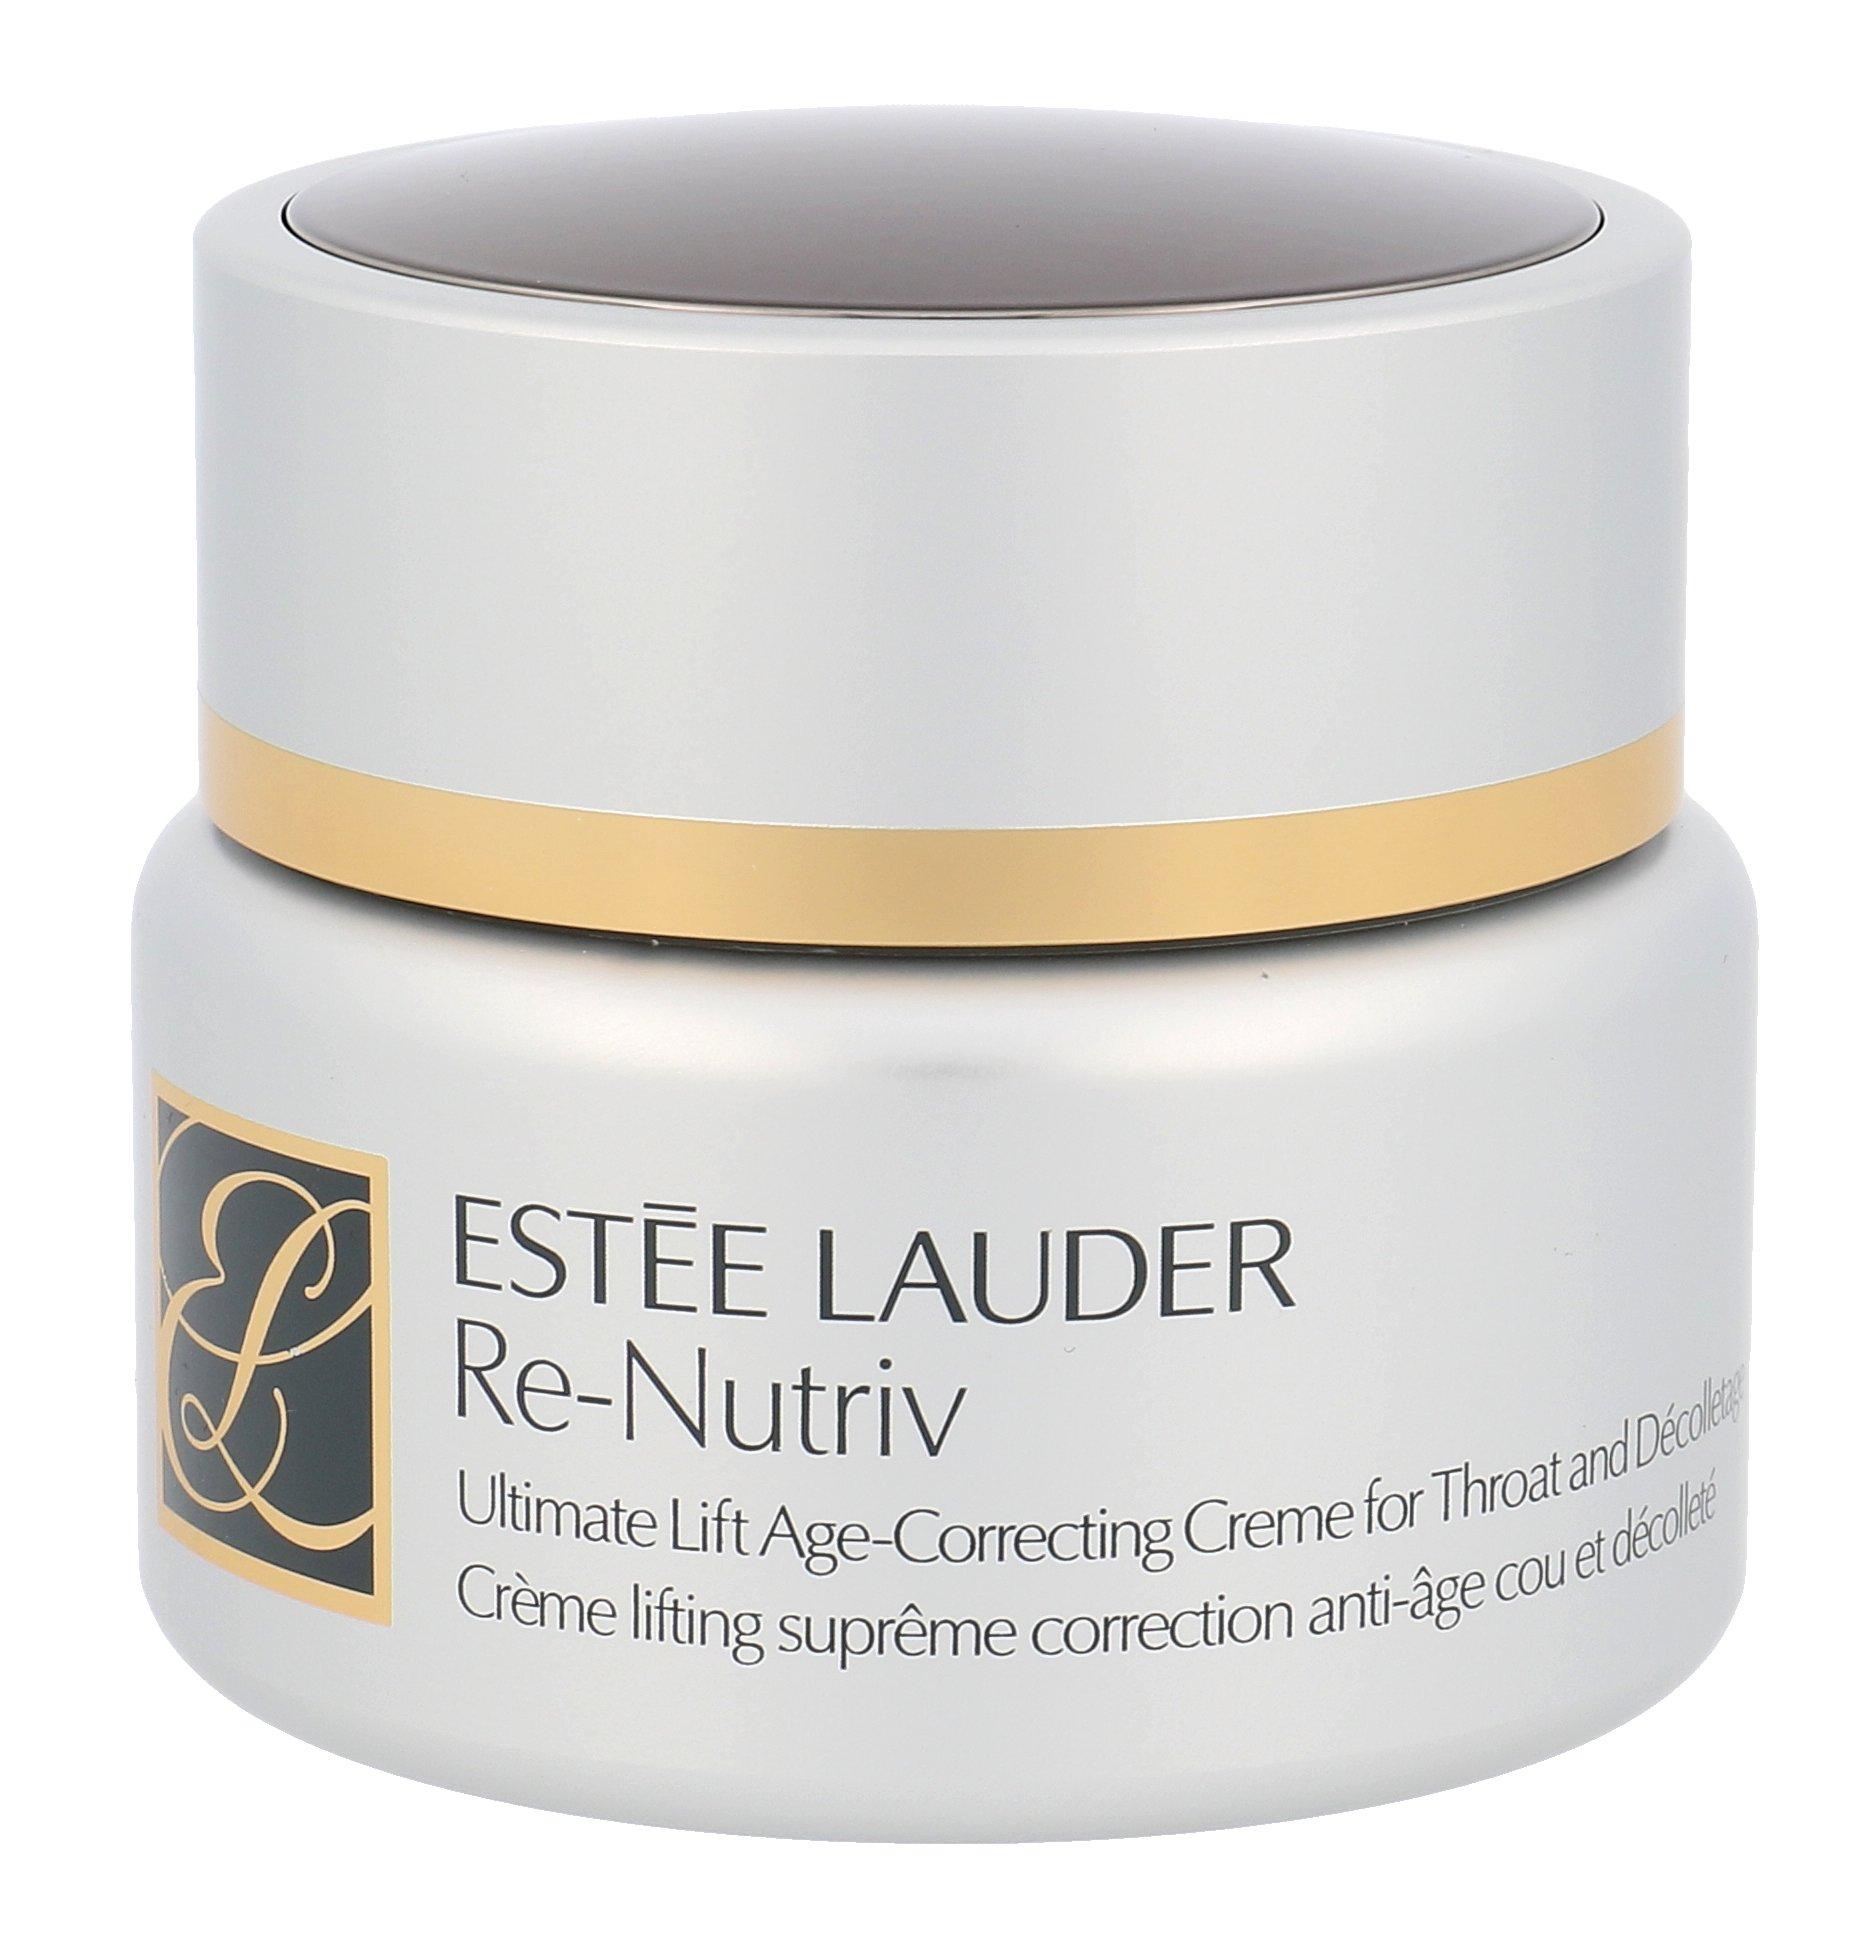 Estée Lauder Re-Nutritiv Ultimate Lift Age-Correcting Creme for Throat and Décolletage 50 ml